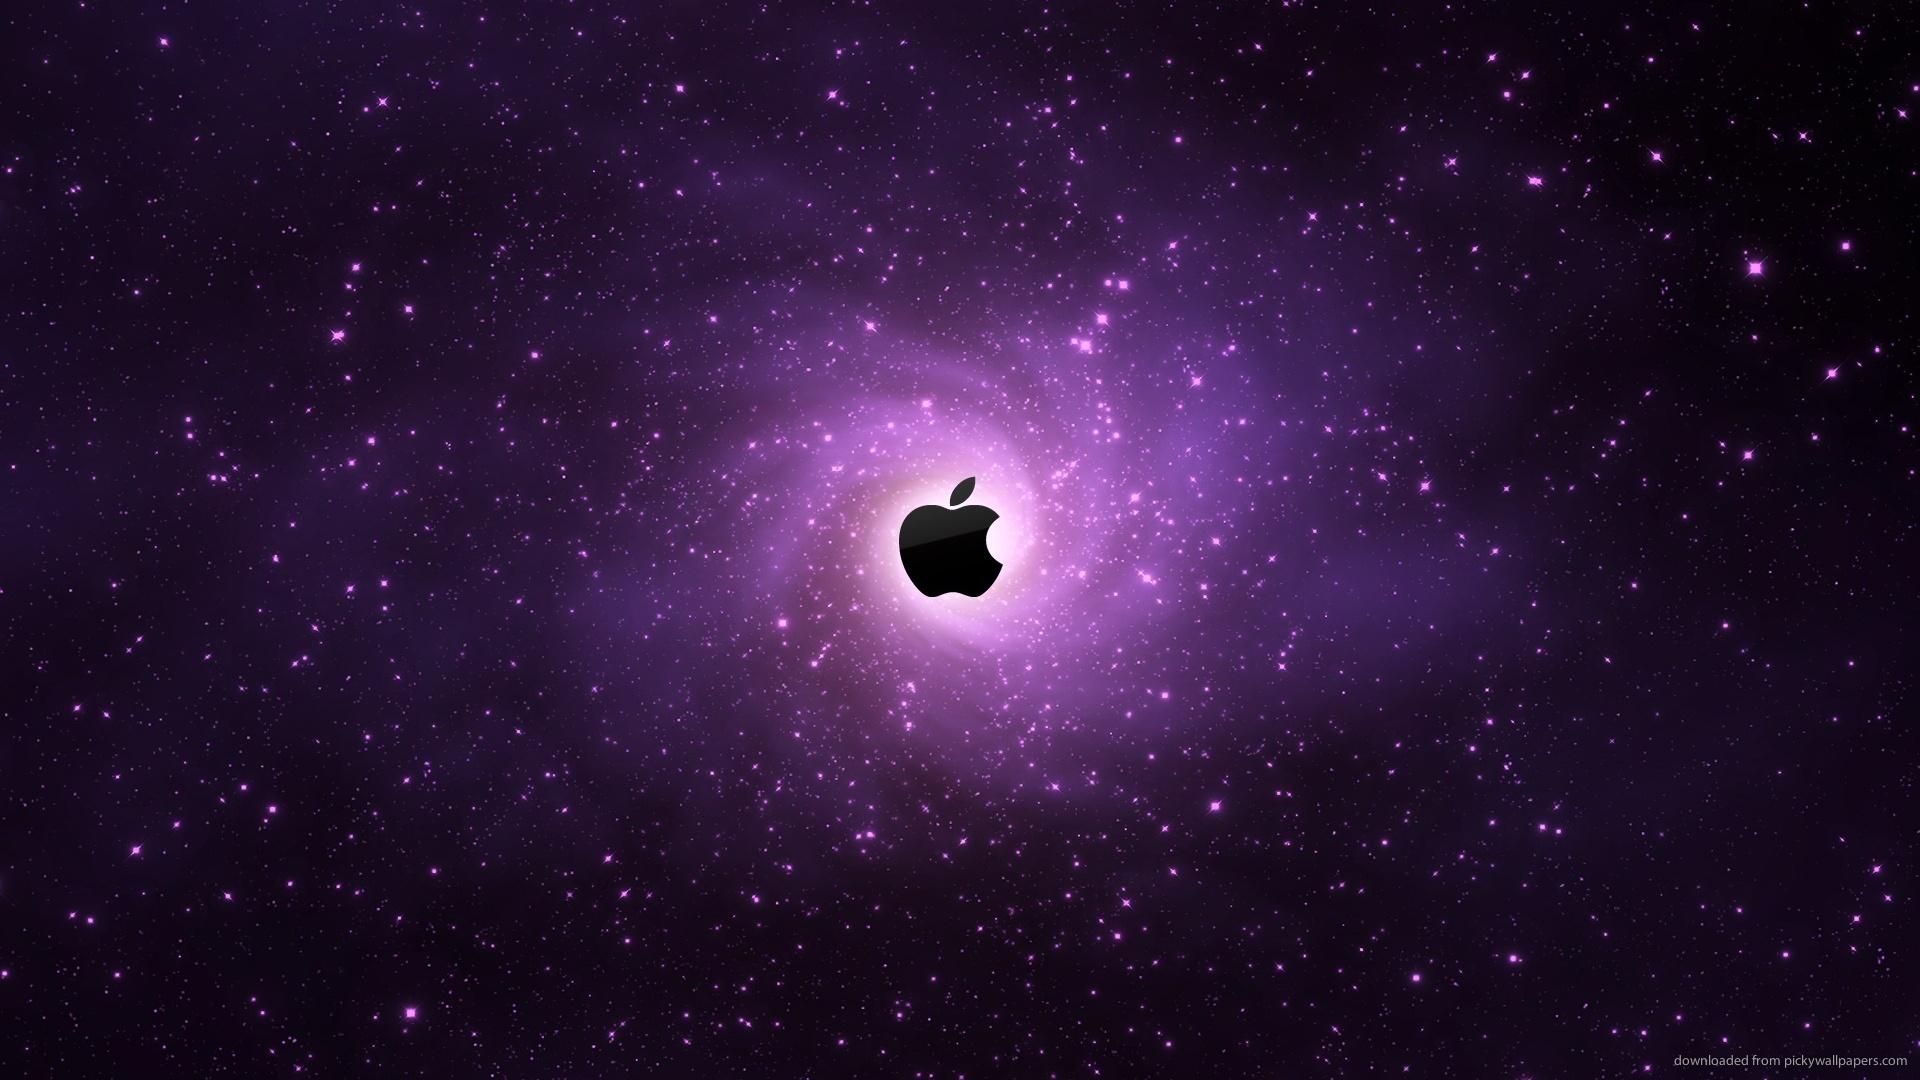 Must see Wallpaper Mac 1080p - hd-wallpapers-for-mac-1920x1080-7  Trends_151356.jpg